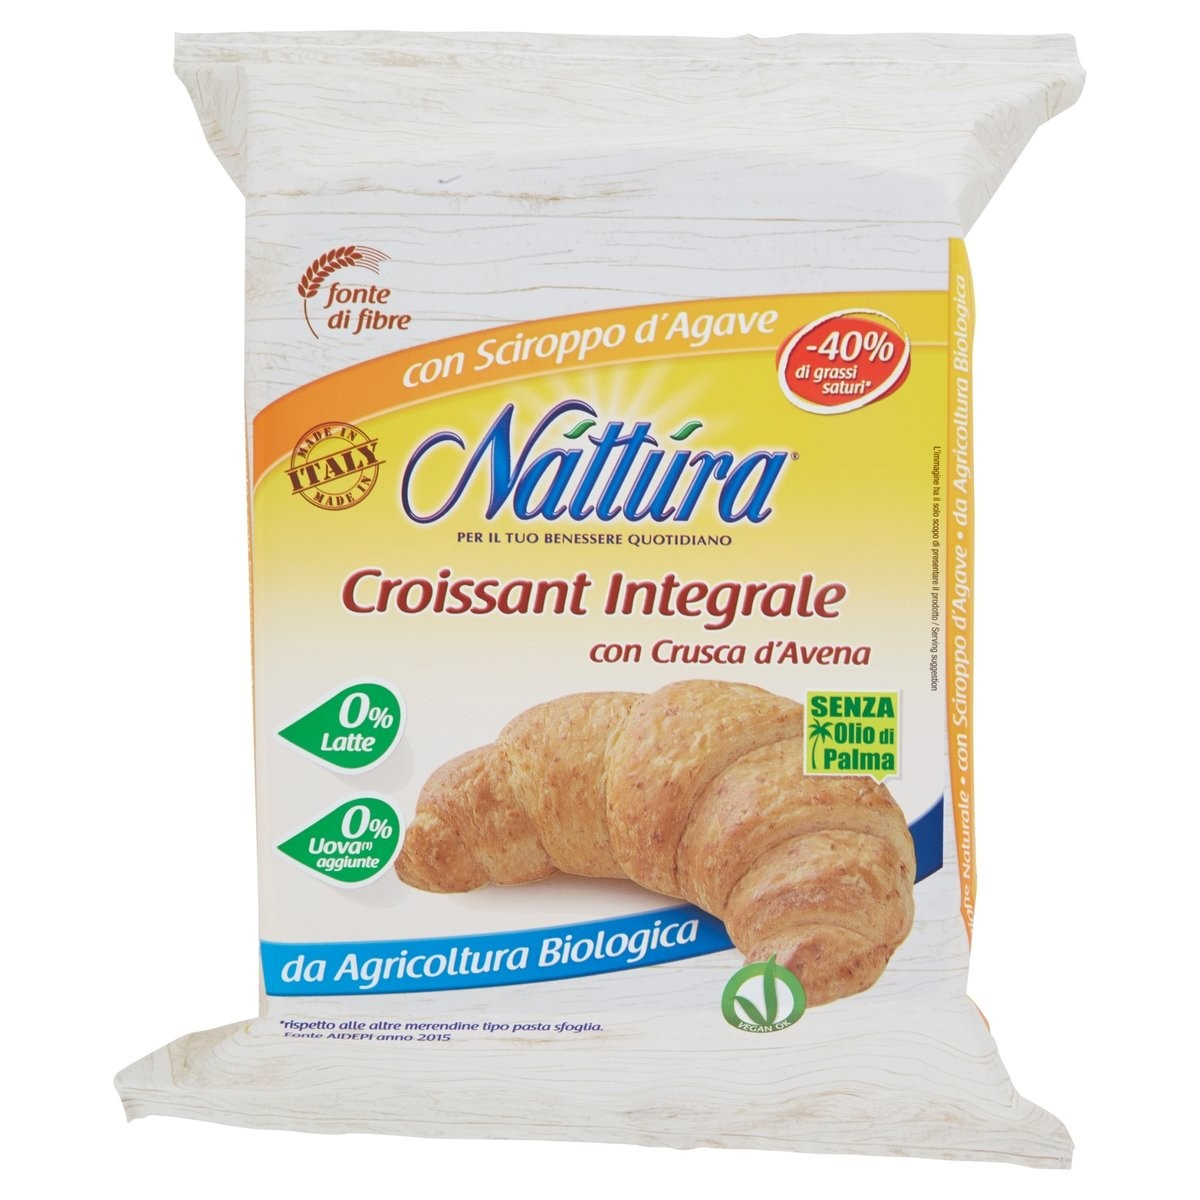 Croissant integrale bio